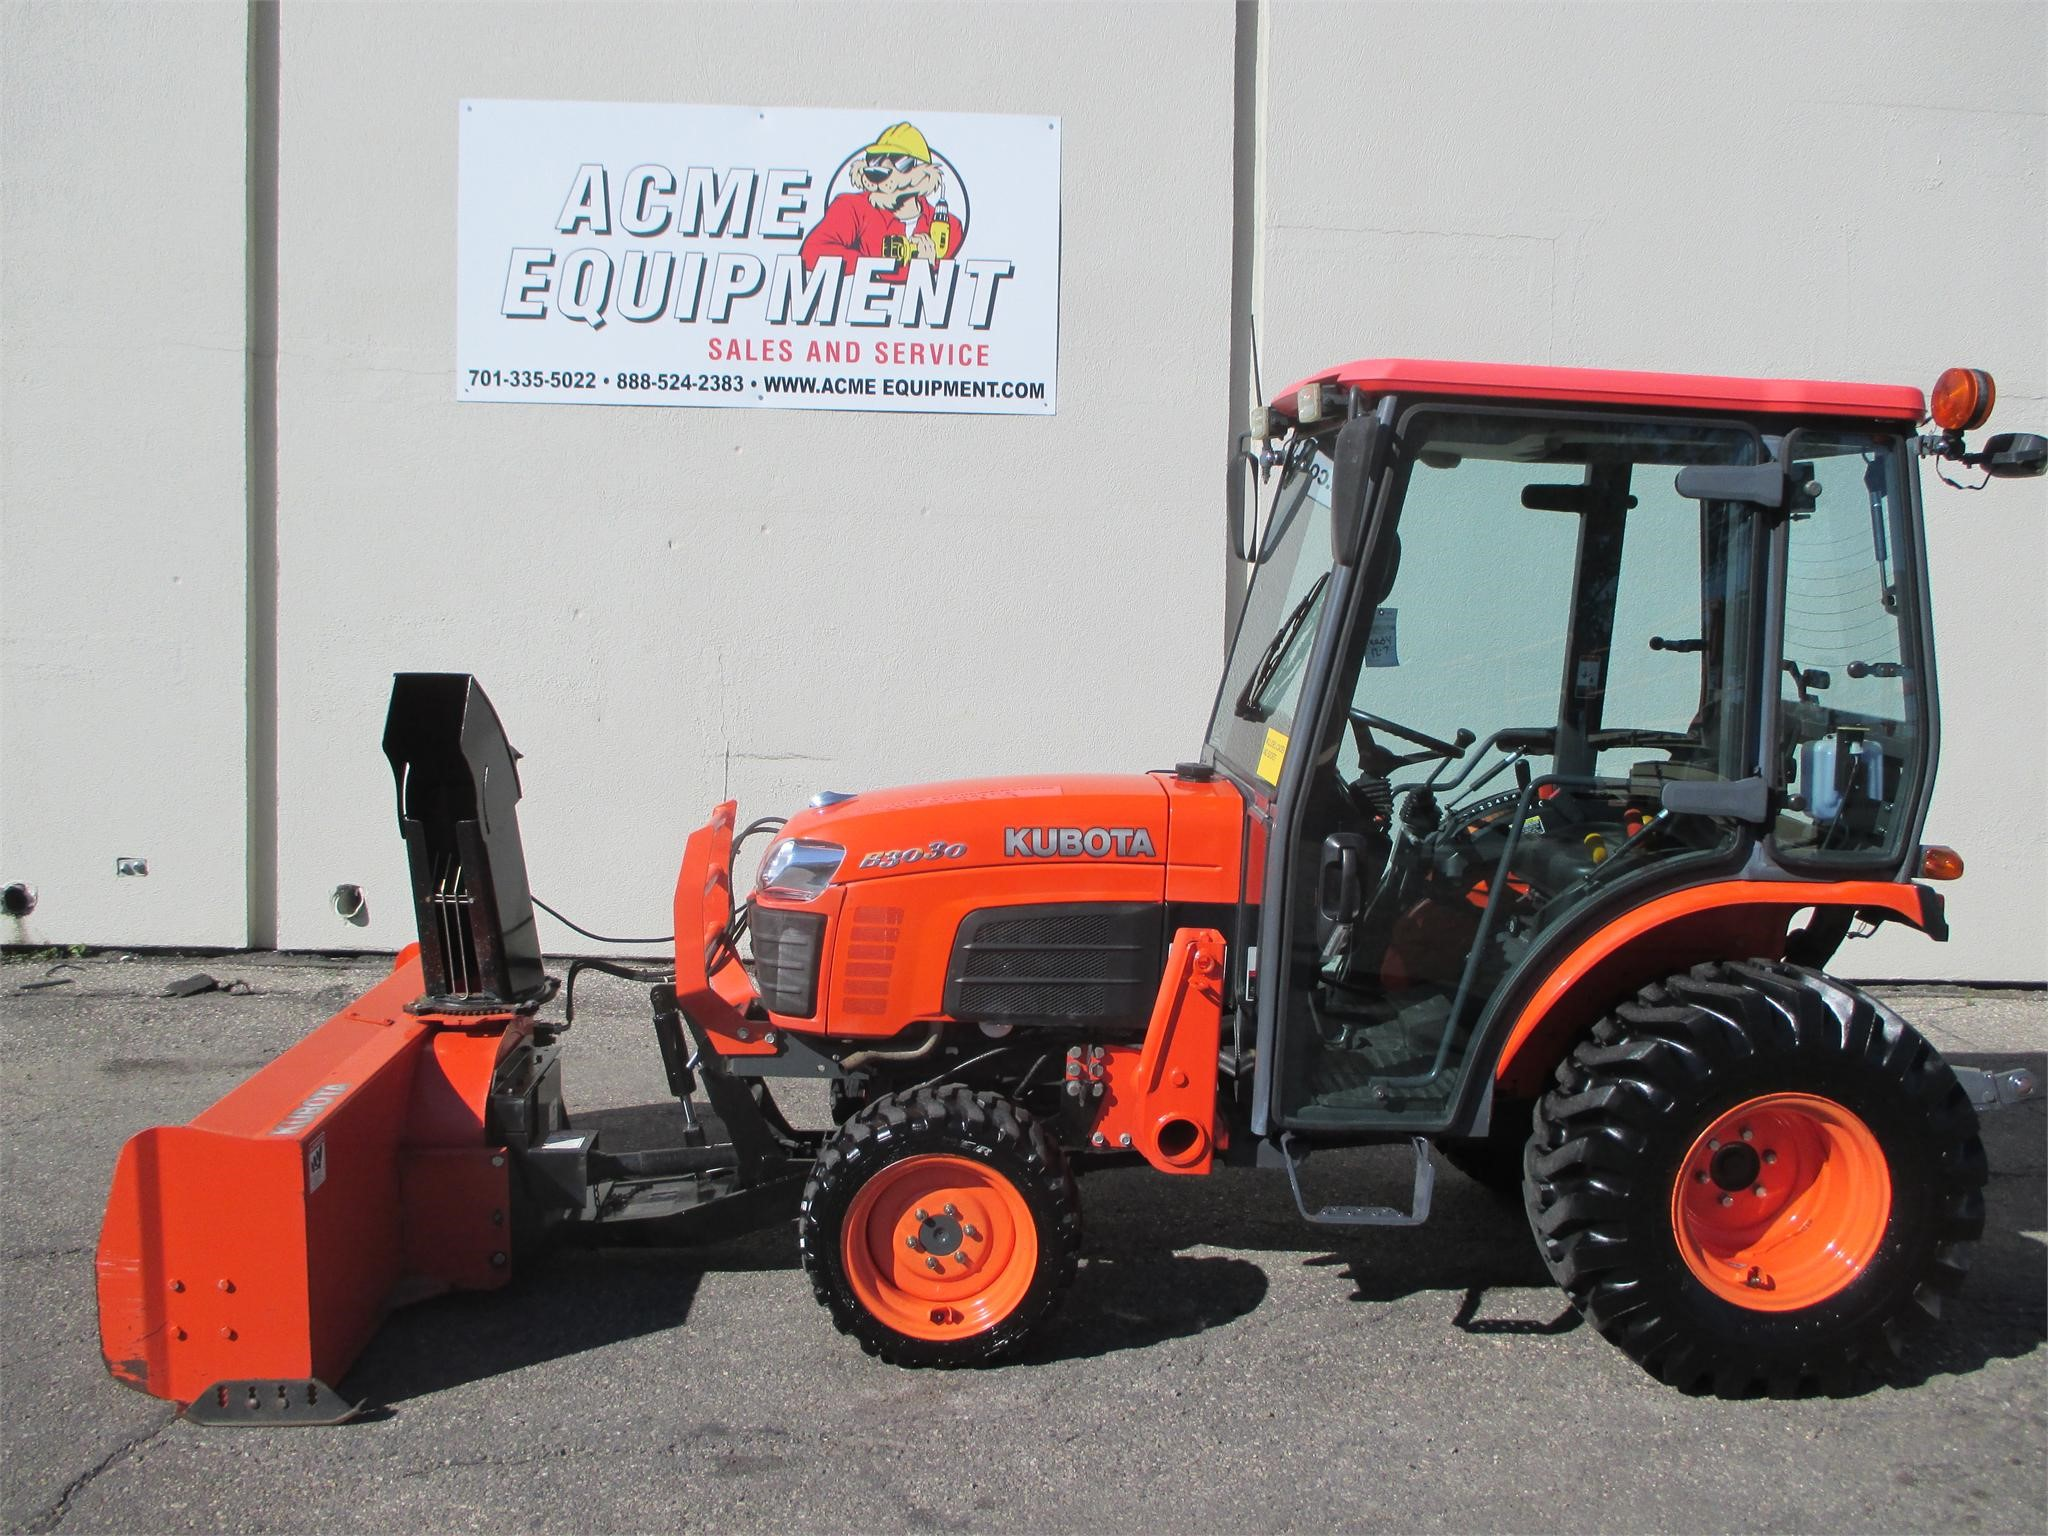 Used 2010 Kubota B3030hsdc Tractors Less Than 40 Hp Ebay